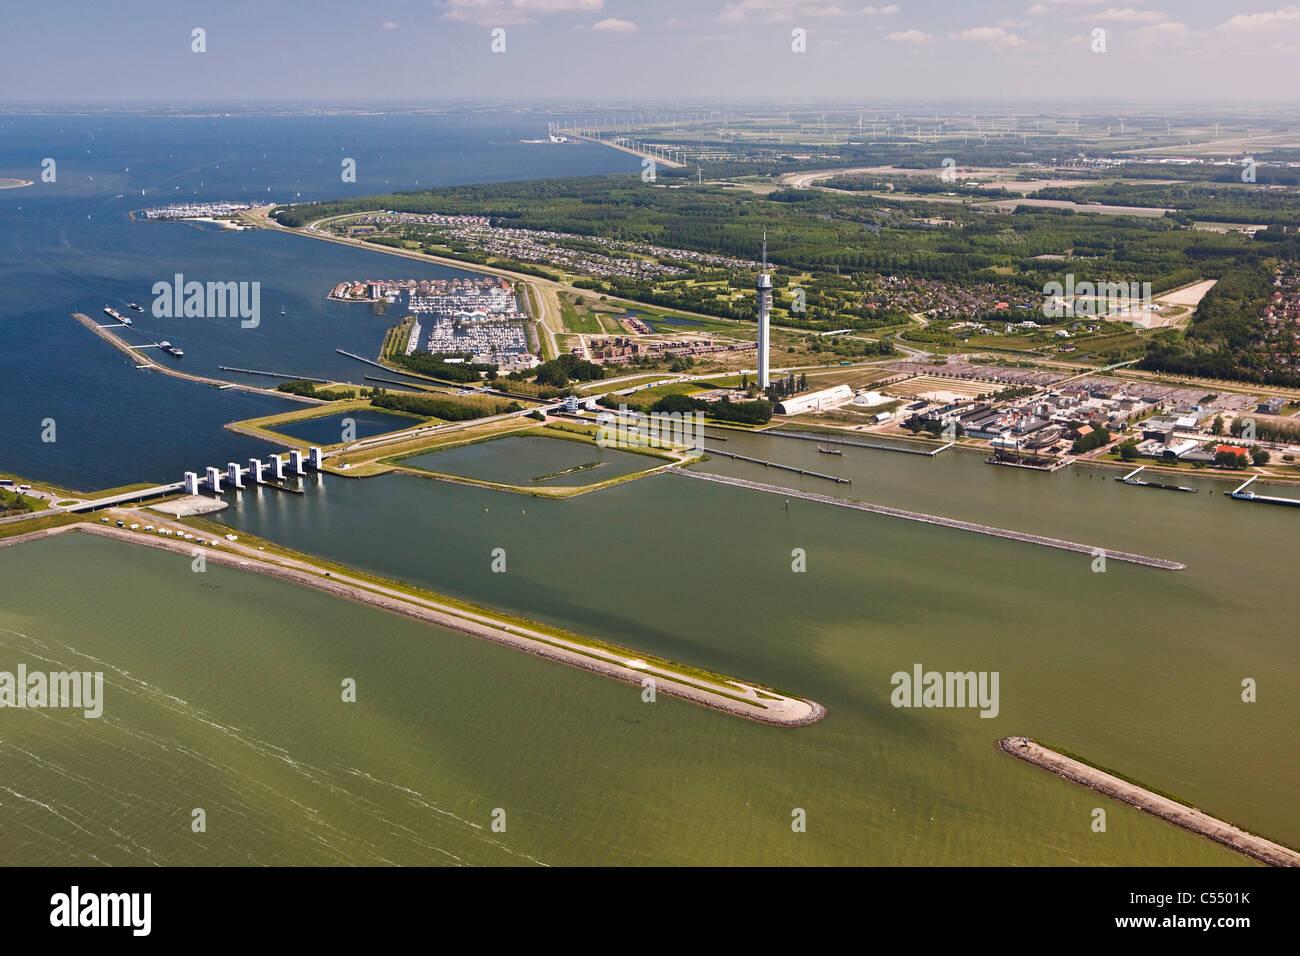 The Netherlands, Lelystad, View on dam, locks, marina, Broadcasting TV tower and Flevopolder. Aerial - Stock Image